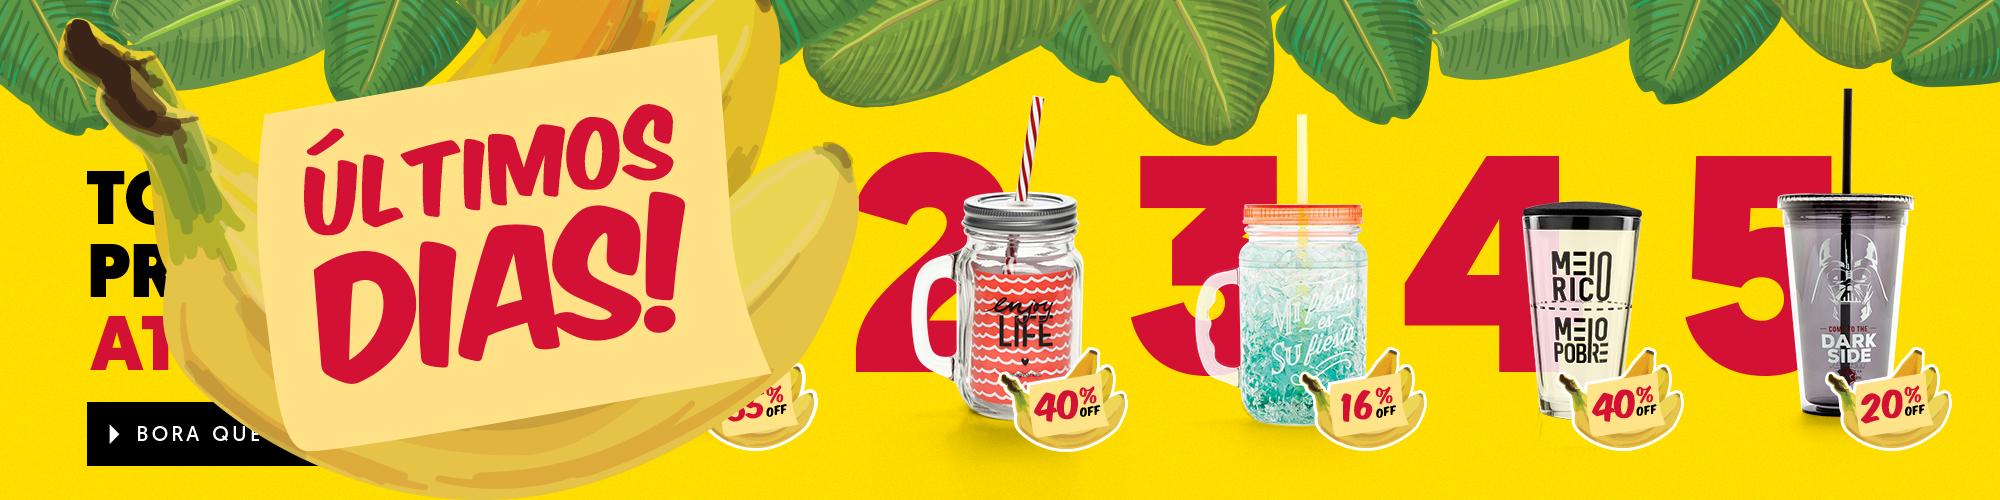 A - Banner 06 - Banana Copos II